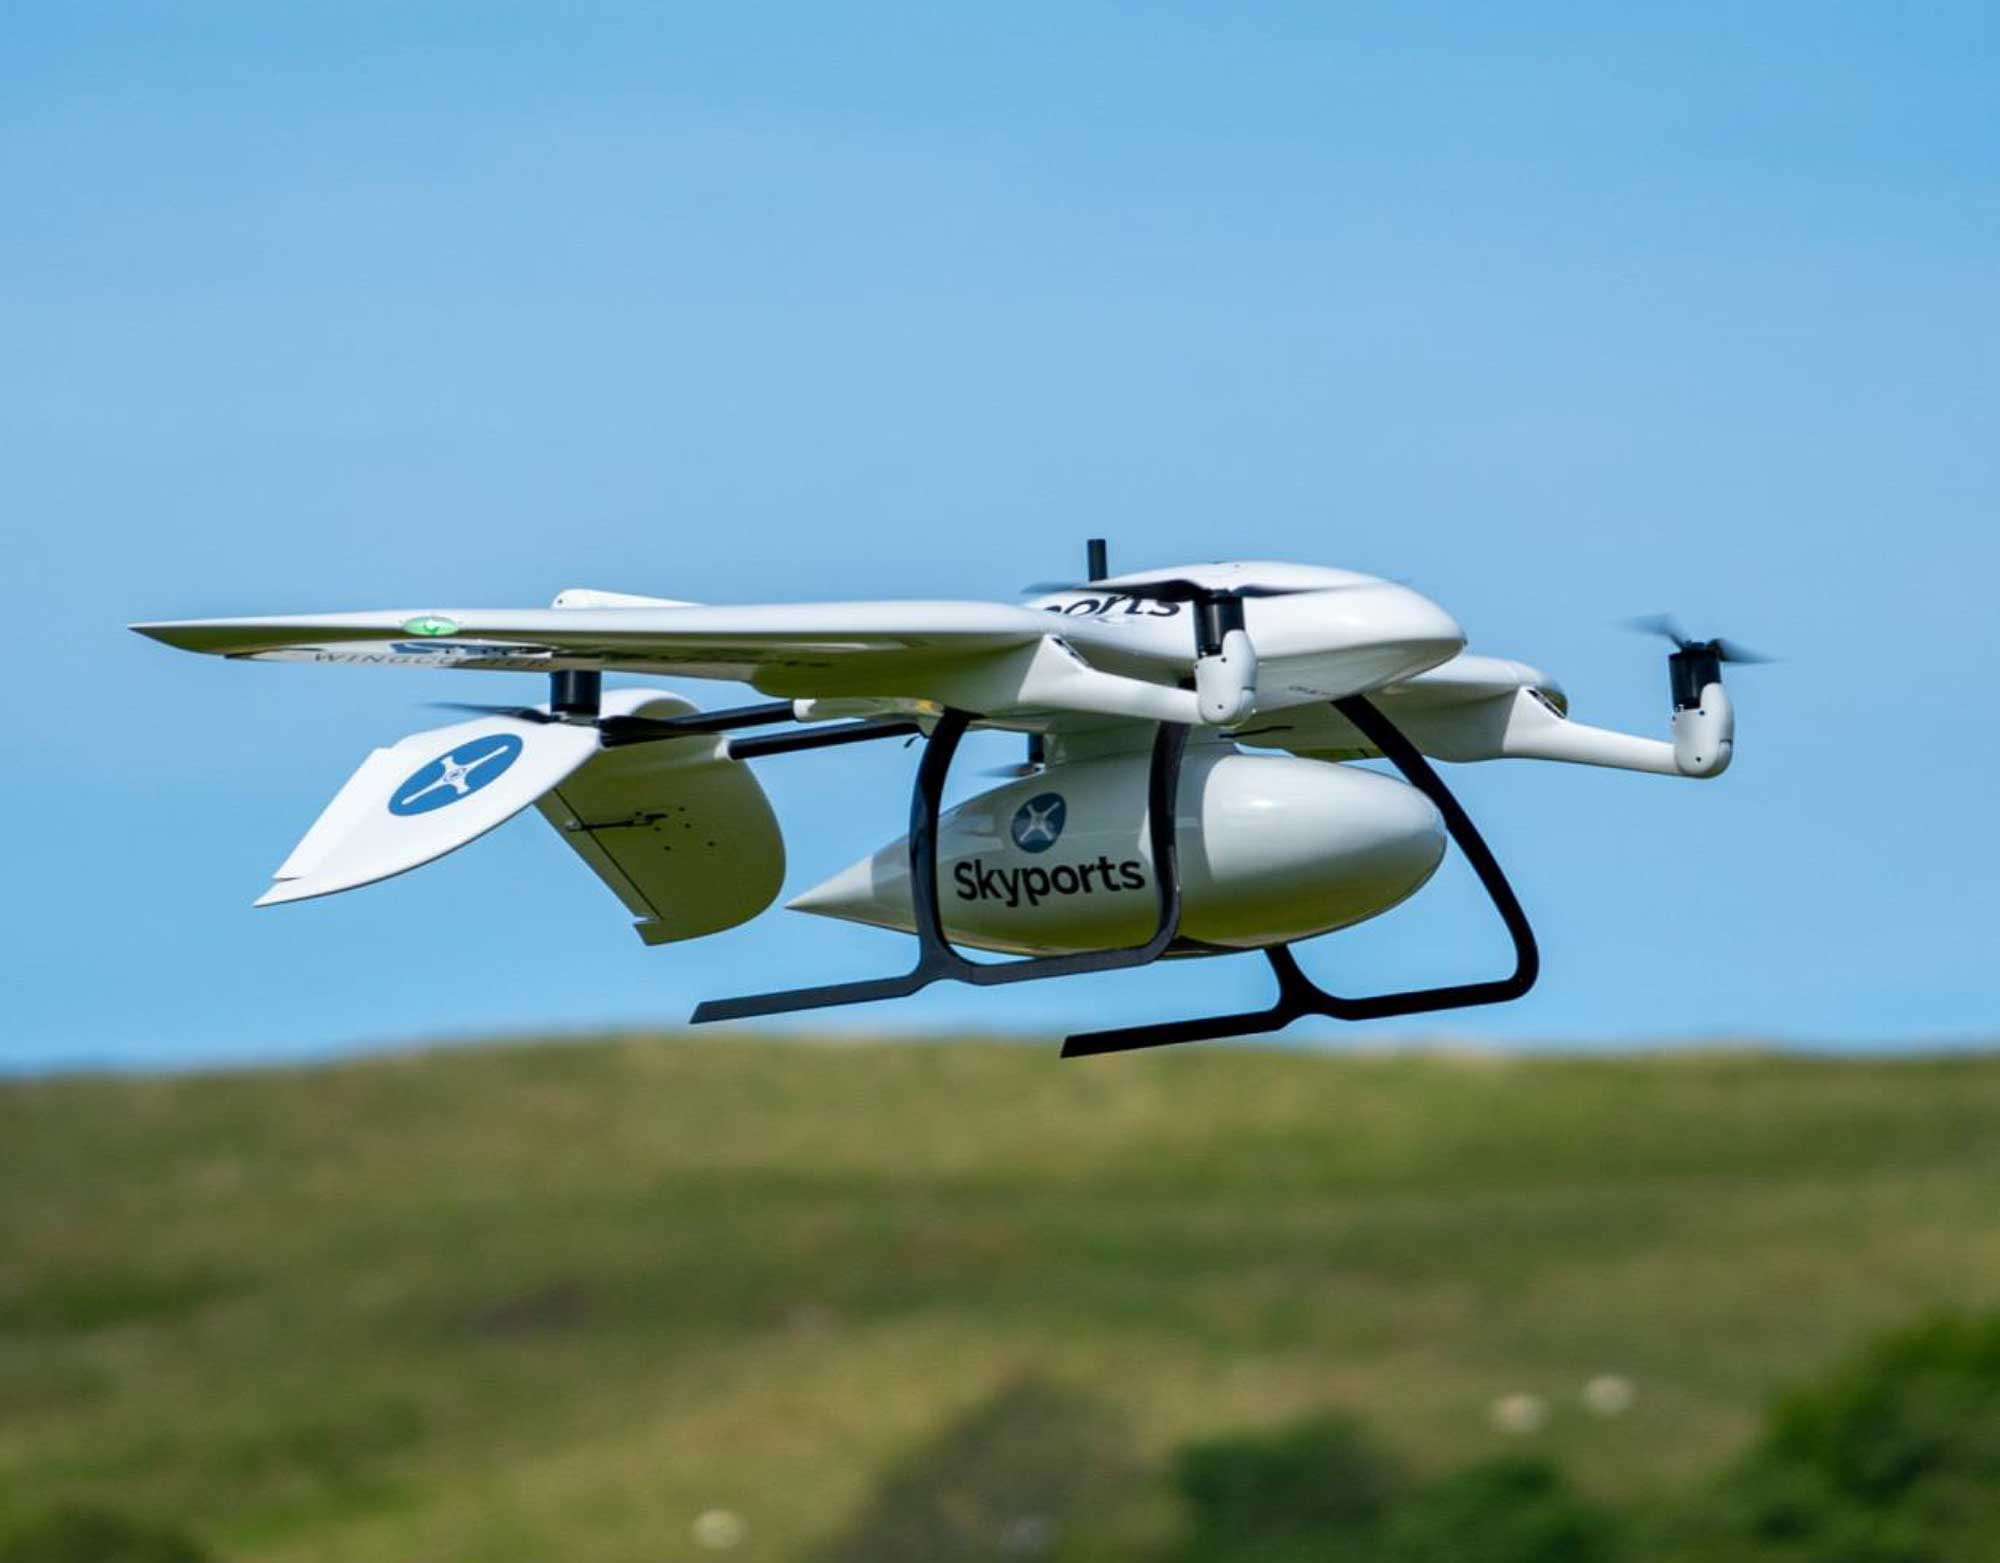 Skyports drone